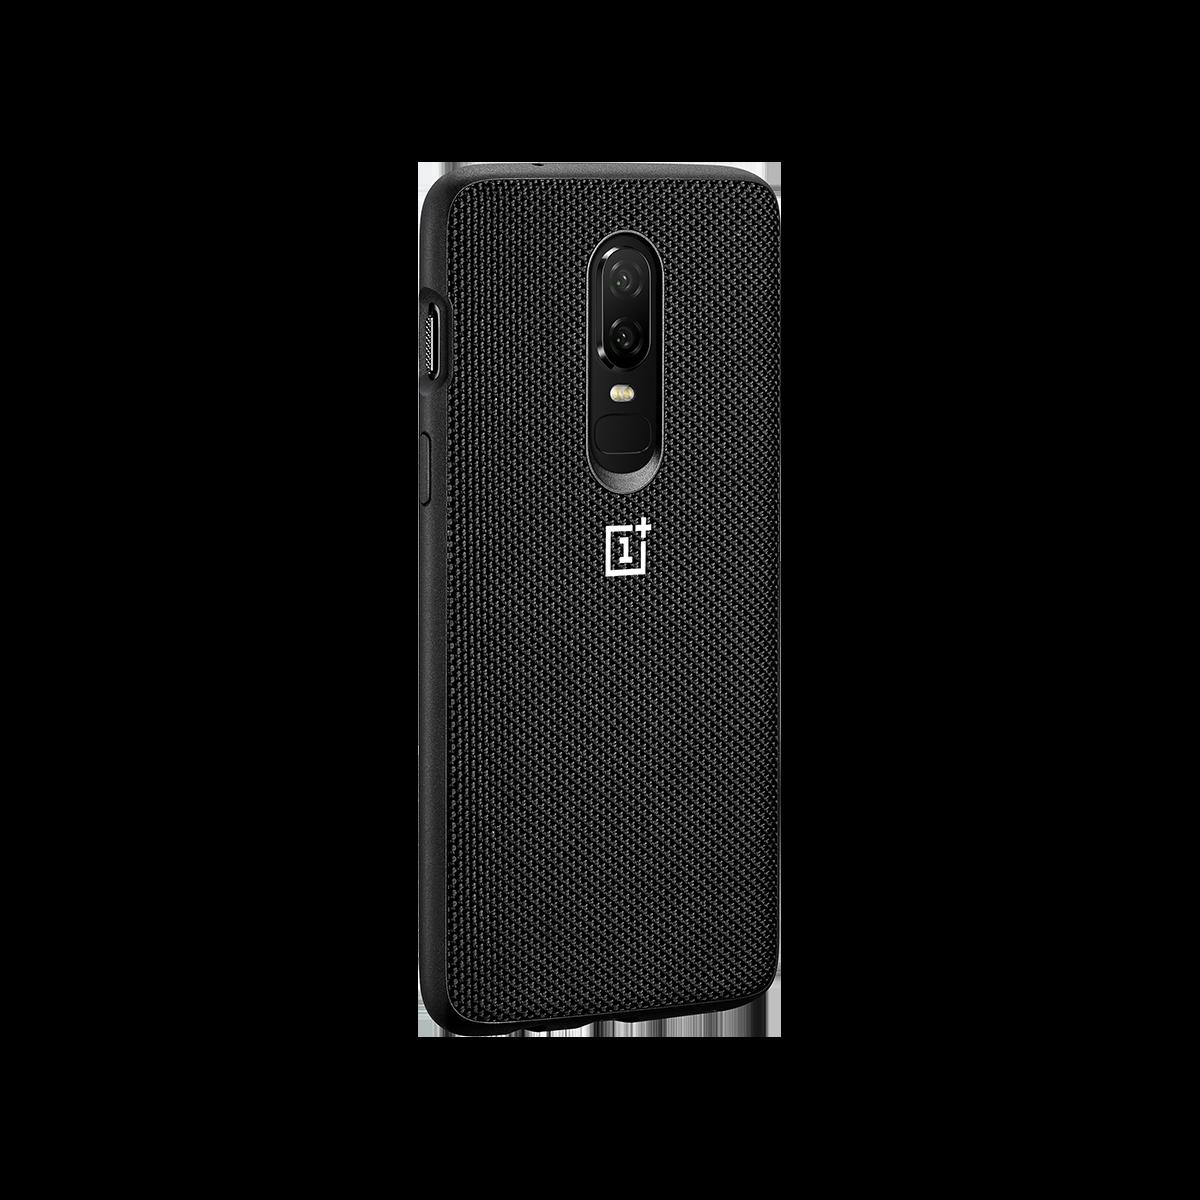 OnePlus 6 Bumper Case Nylon Black